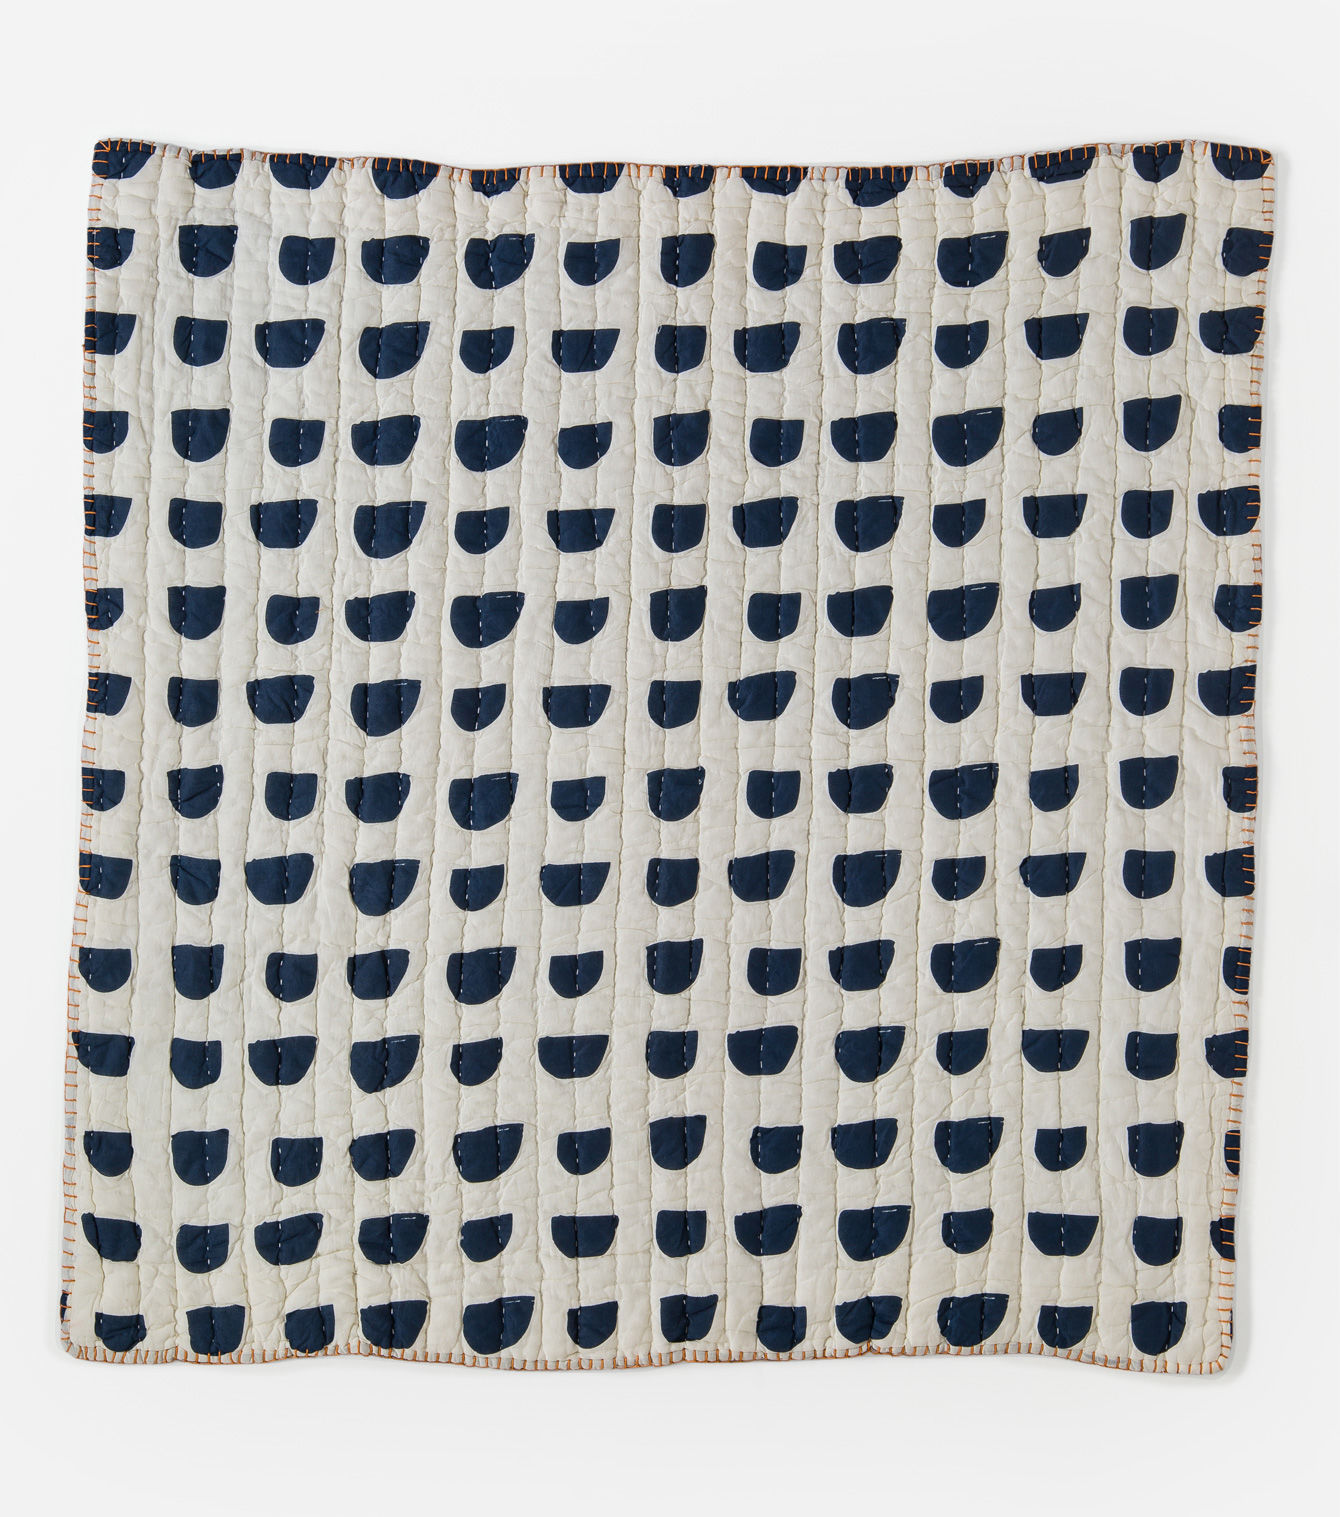 1FLC1021-bug-critters-blue-cup-pattern-blanket-02_0318_005-1.jpg